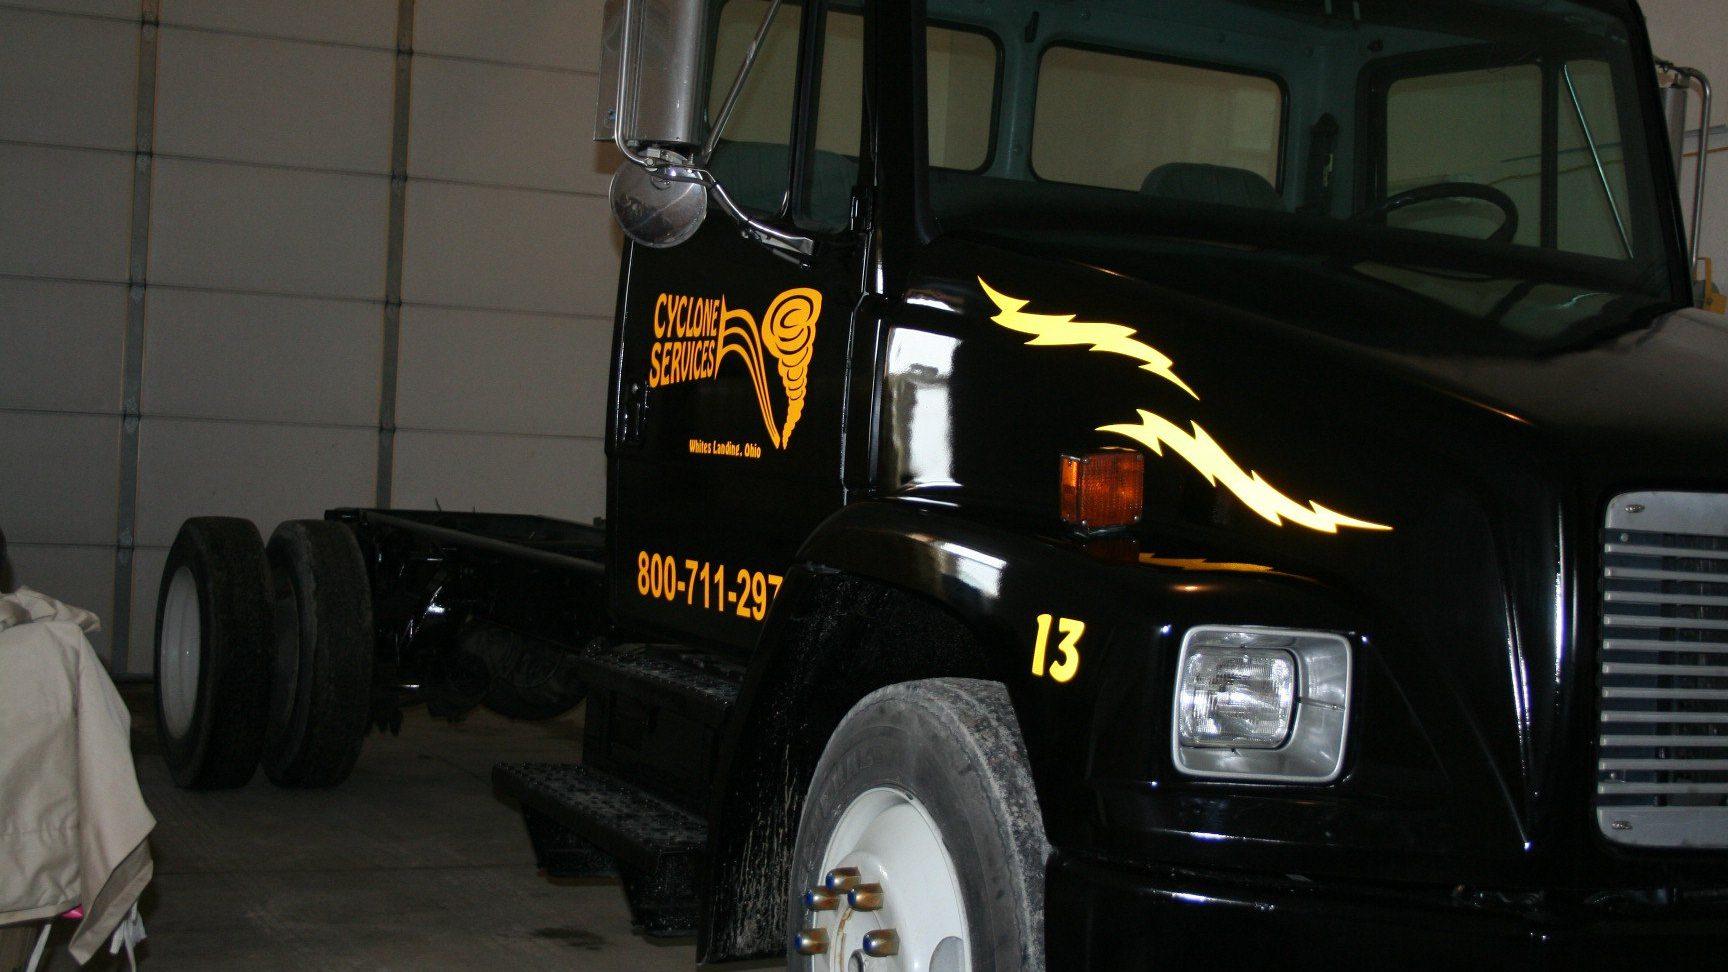 Cyclone Truck Reflective